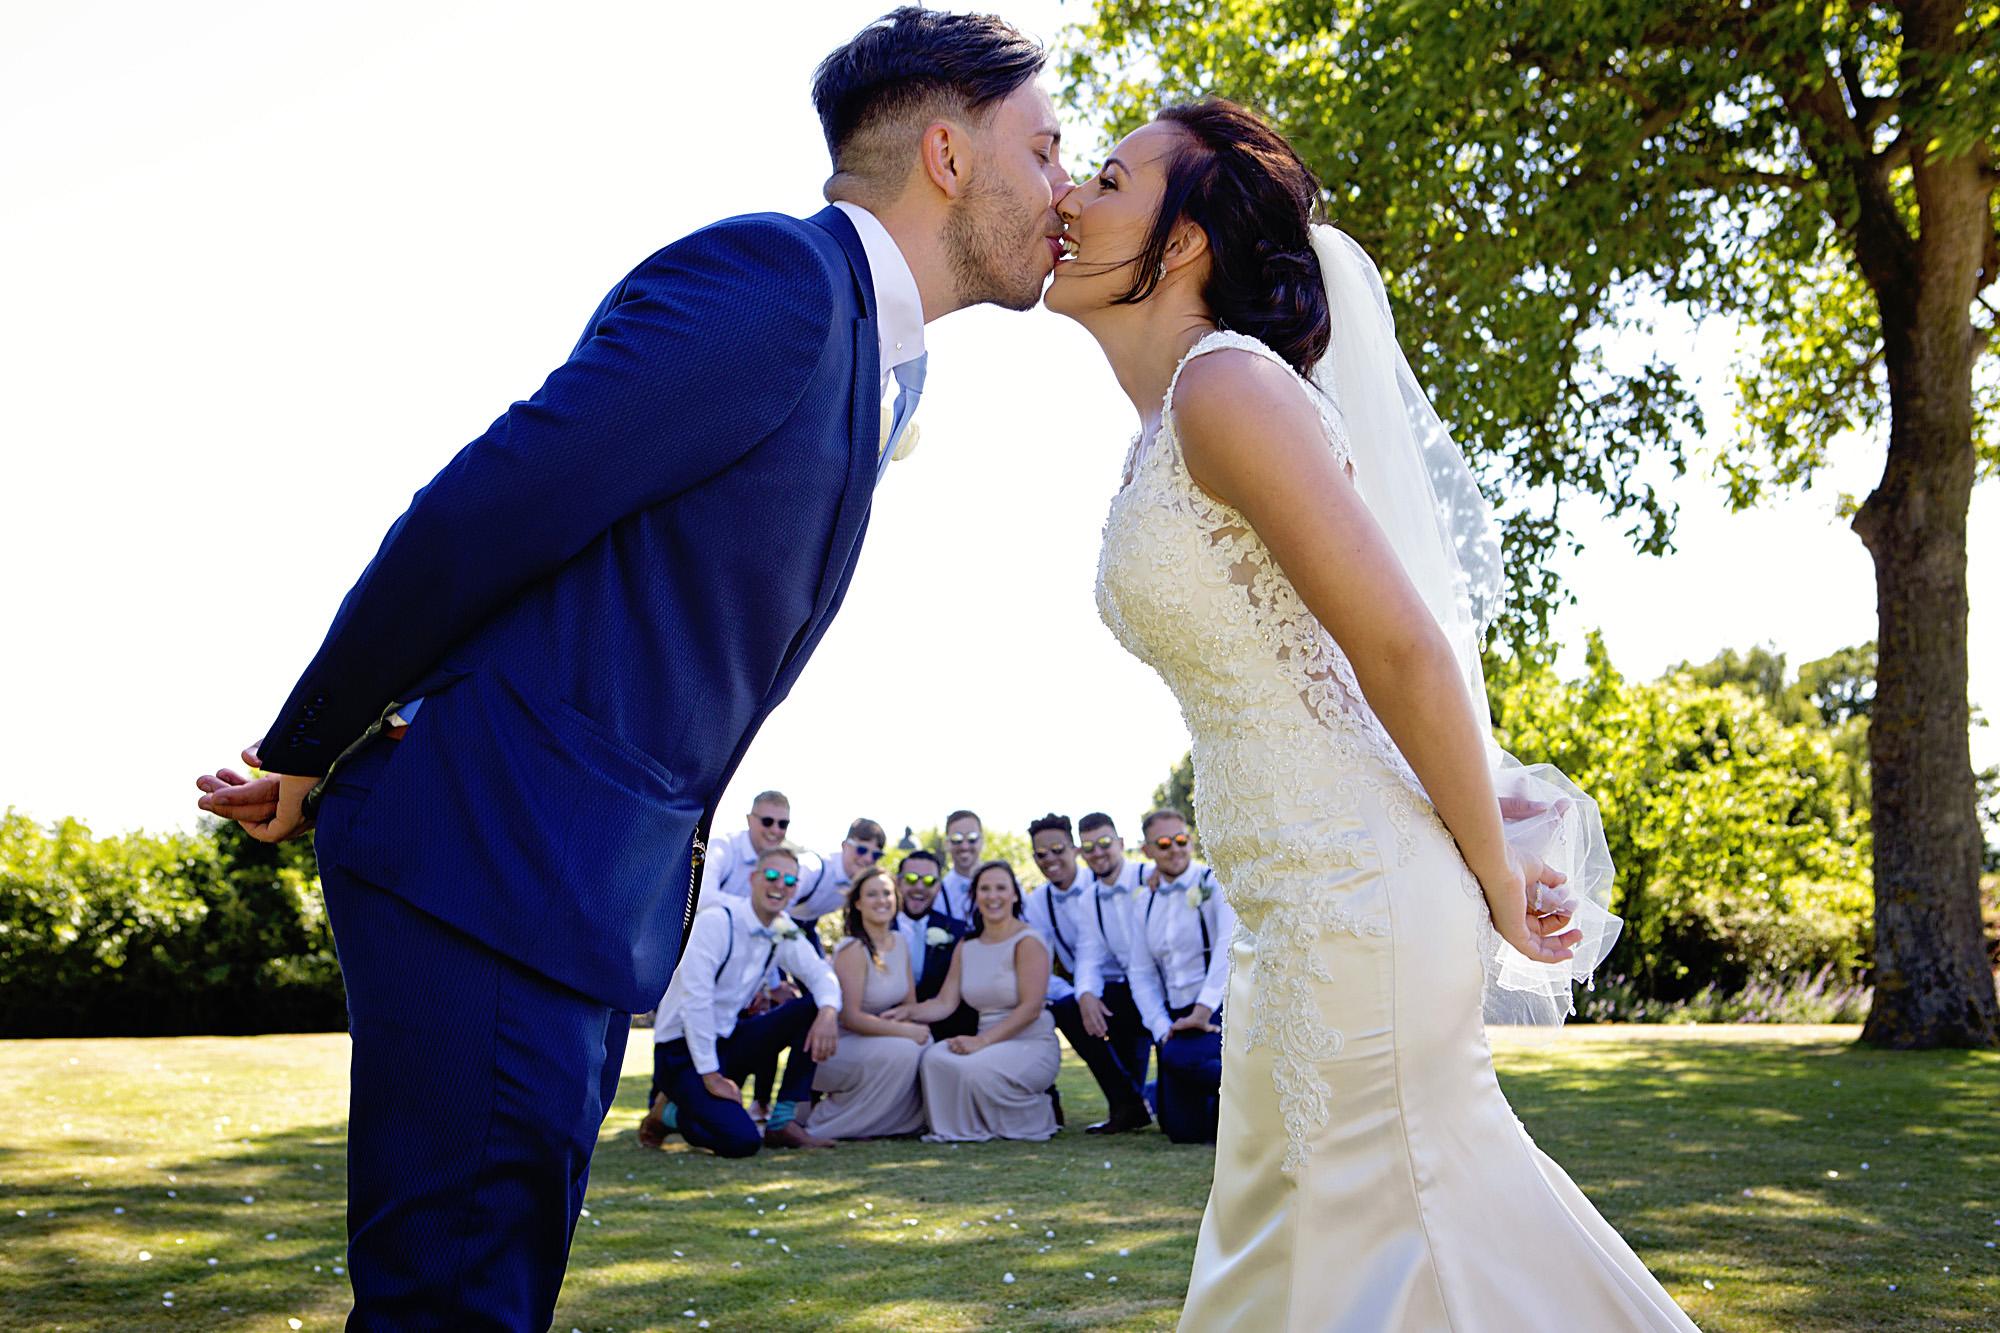 wedding-barnsdale-hall (25).jpg